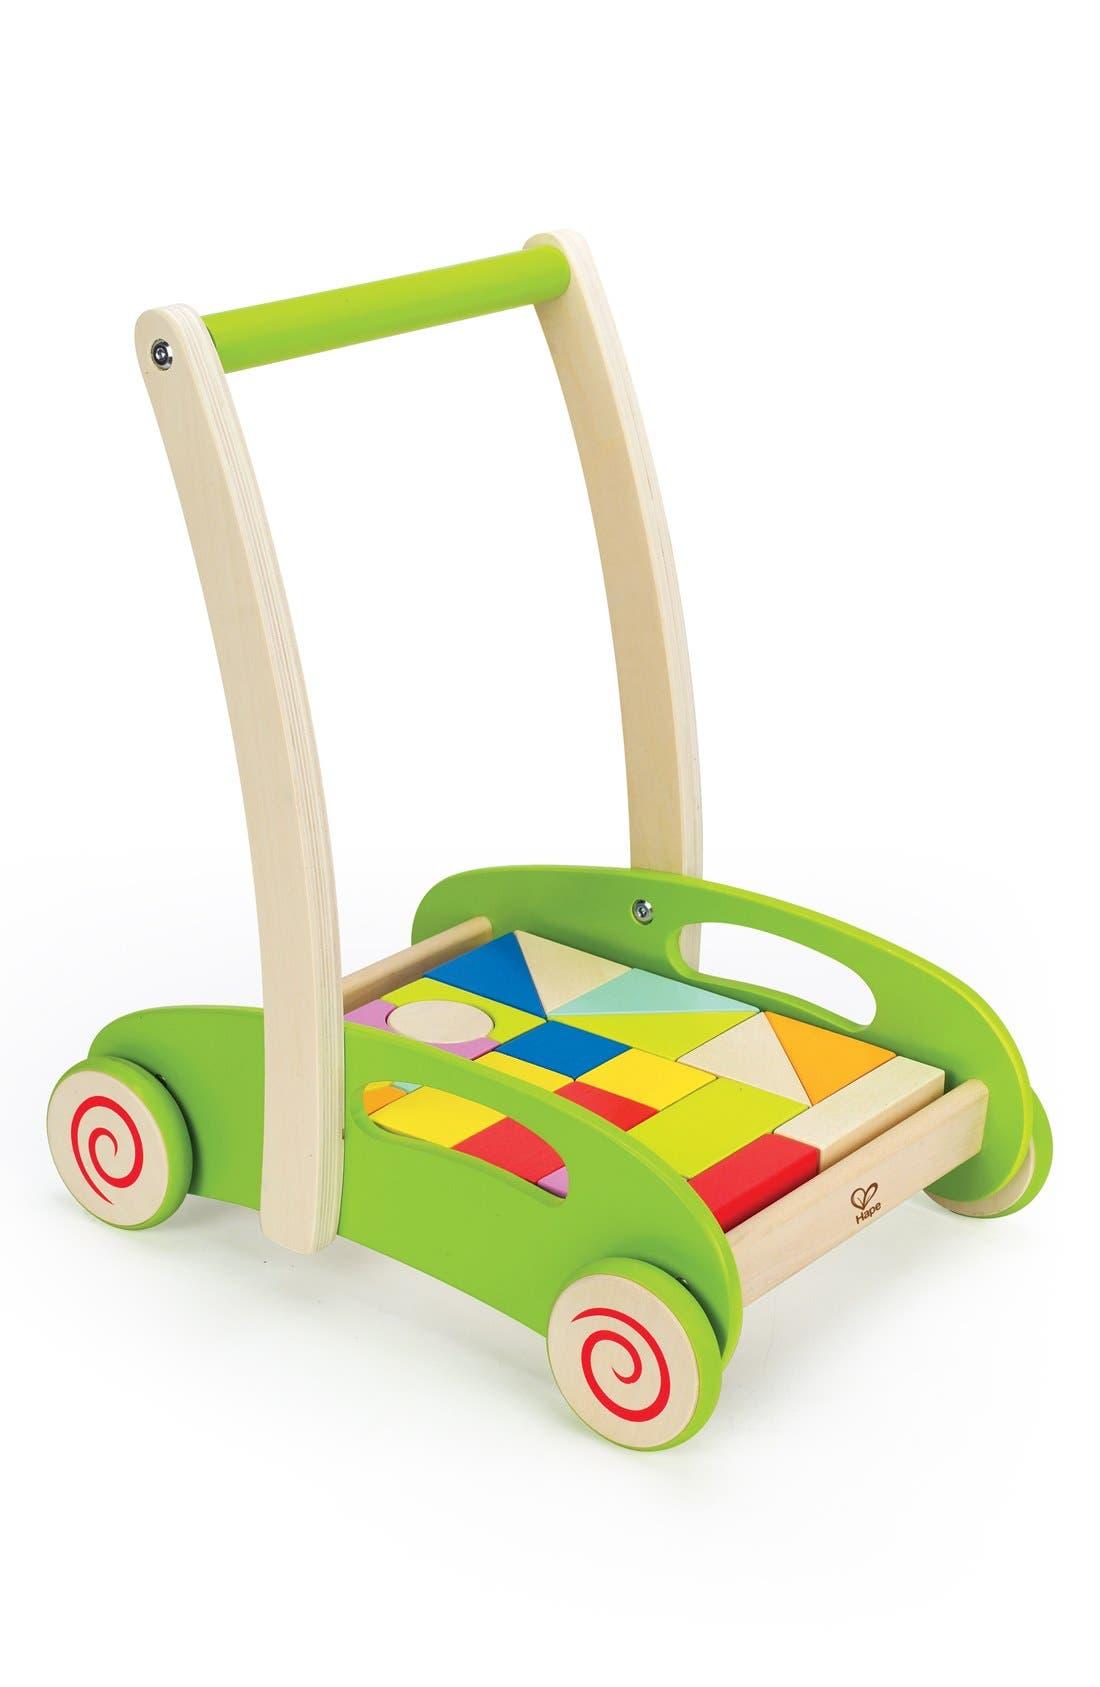 Hape 'Block & Roll' Push Toy